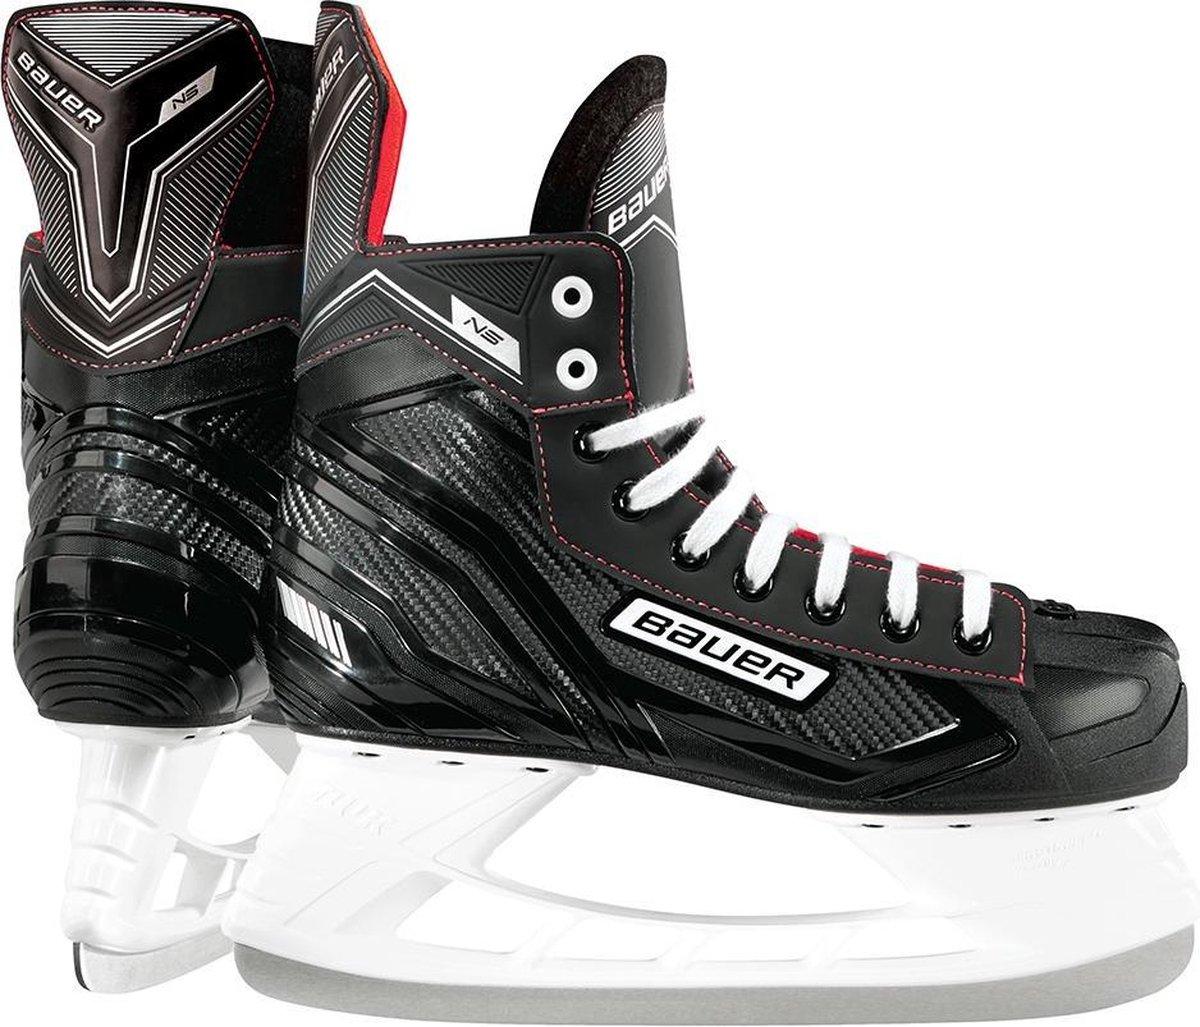 IJshockeyschaats Bauer NS Skate Junior R-Schoenmaat 33,5